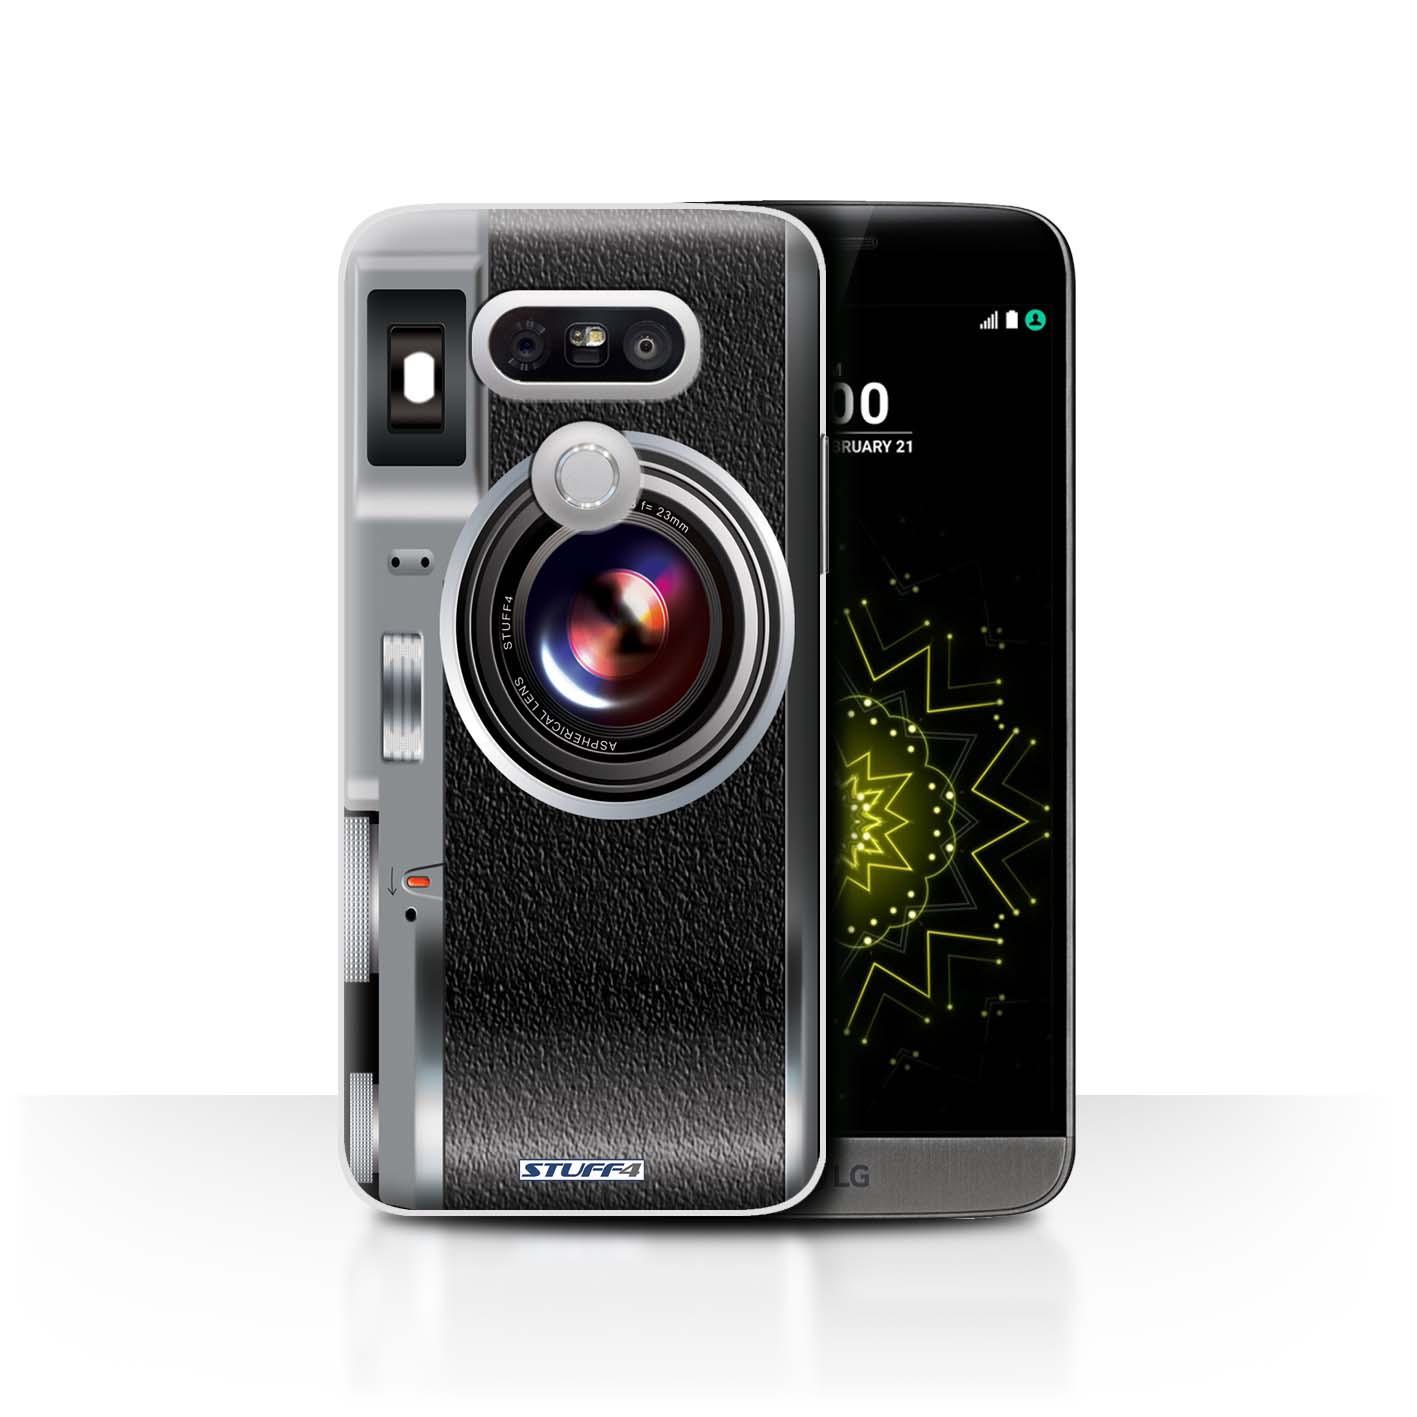 STUFF4 Back Case/Cover/Skin for LG G5/H850/H820/H830/Camera